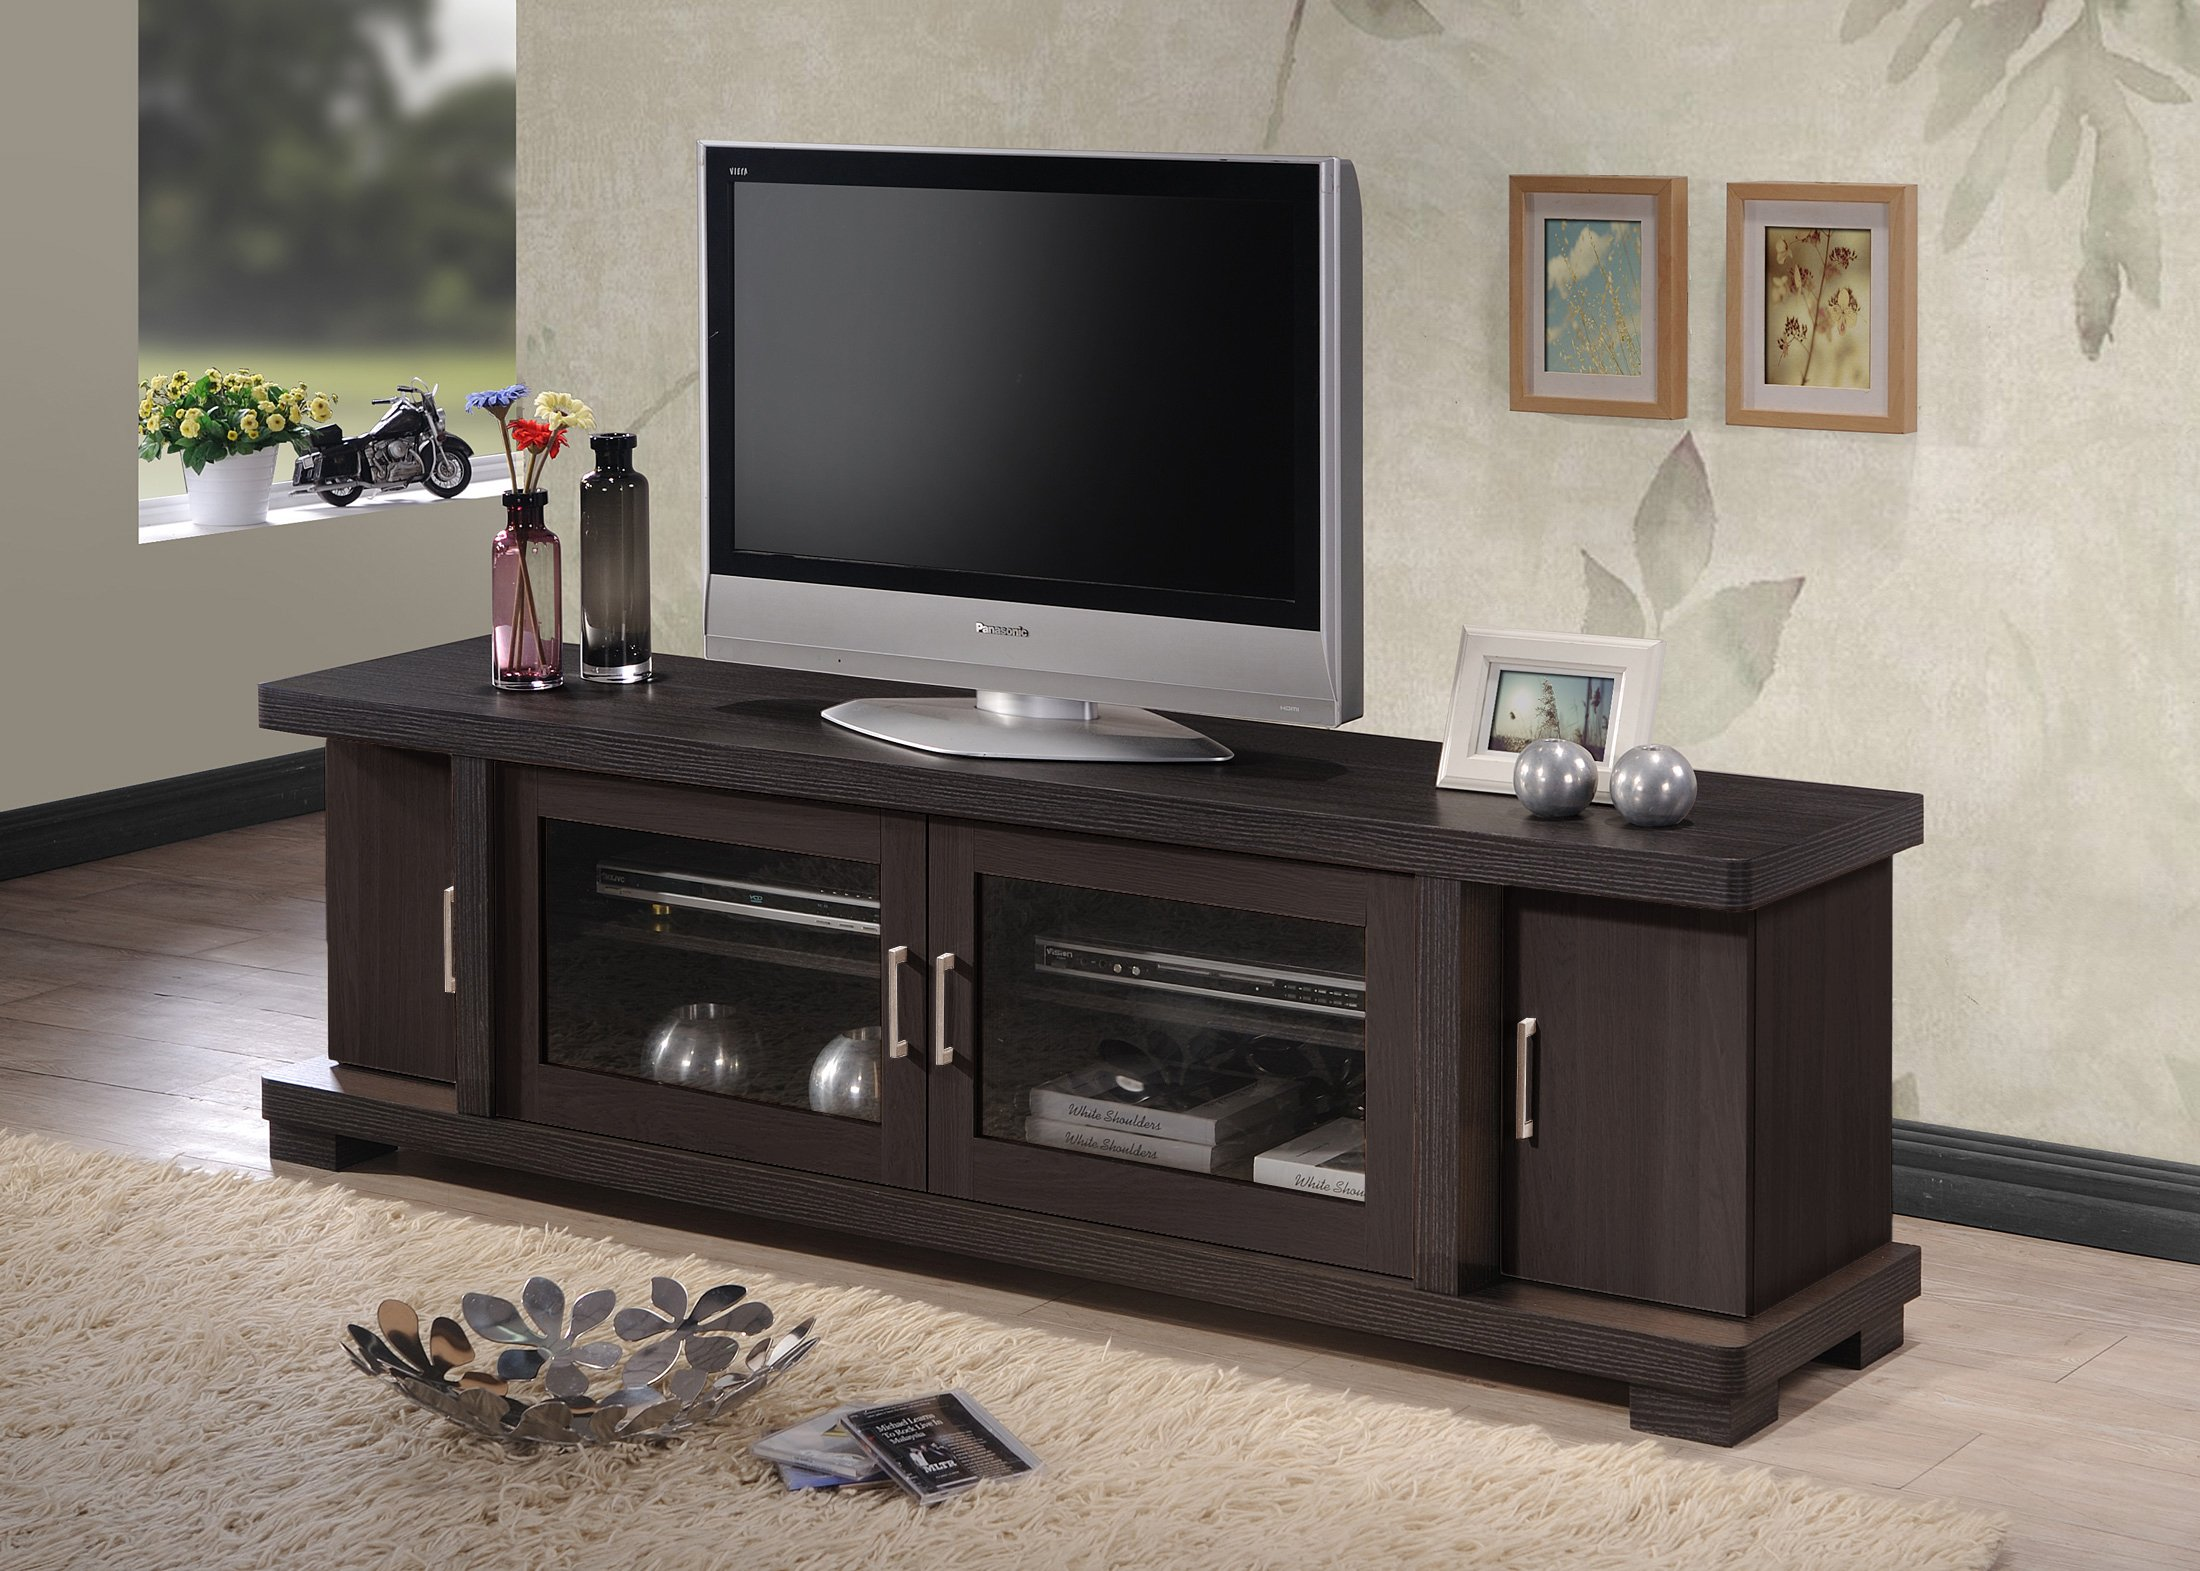 Wholesale Interiors Baxton Studio Viveka Dark Brown Wood TV Cabinet with 2 Glass Doors and 2 Doors, 70''